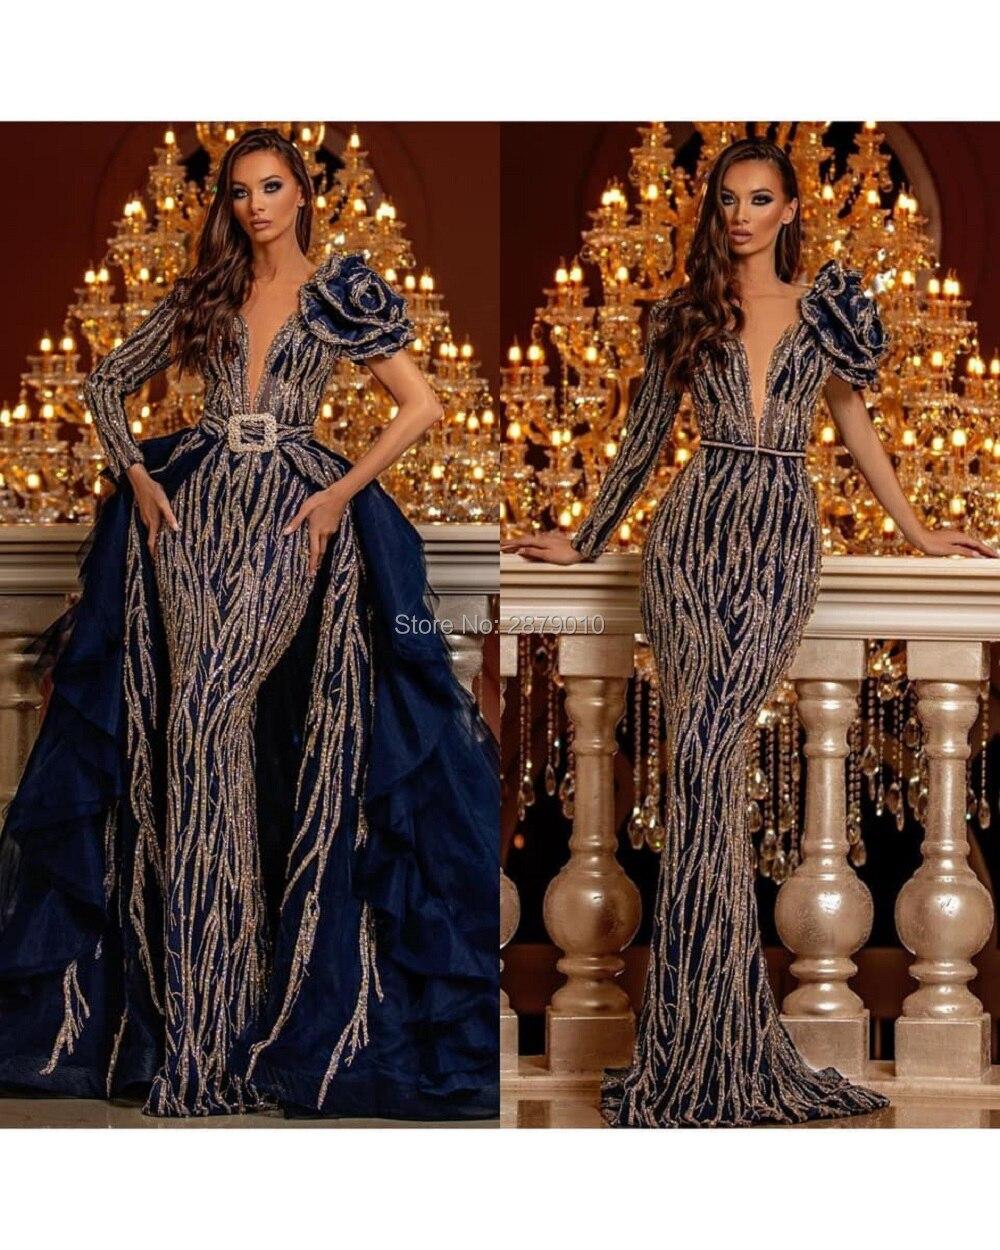 Haute Couture V Neck Mermaid Evening Dress Removable Skirt Floor Length Beaded Sequins Celebrity Dress Robe De Soiree Aibye 2020Evening Dresses   -